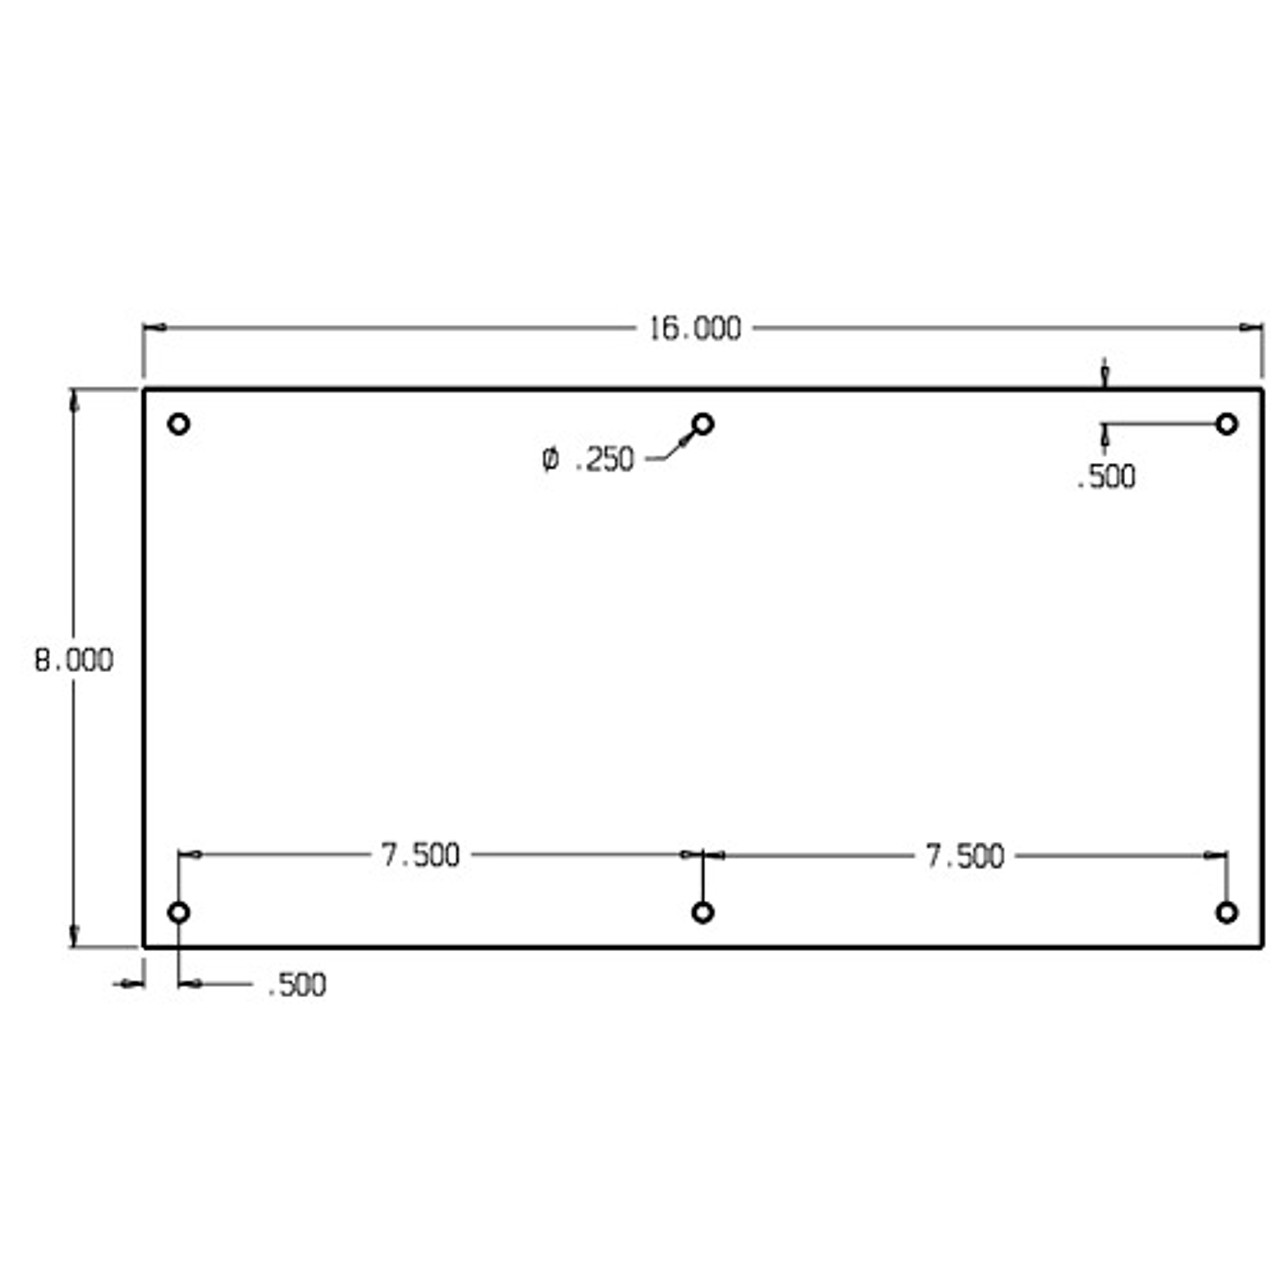 "73-612 Don Jo 0.50 Push Plate in 8 X 16"""